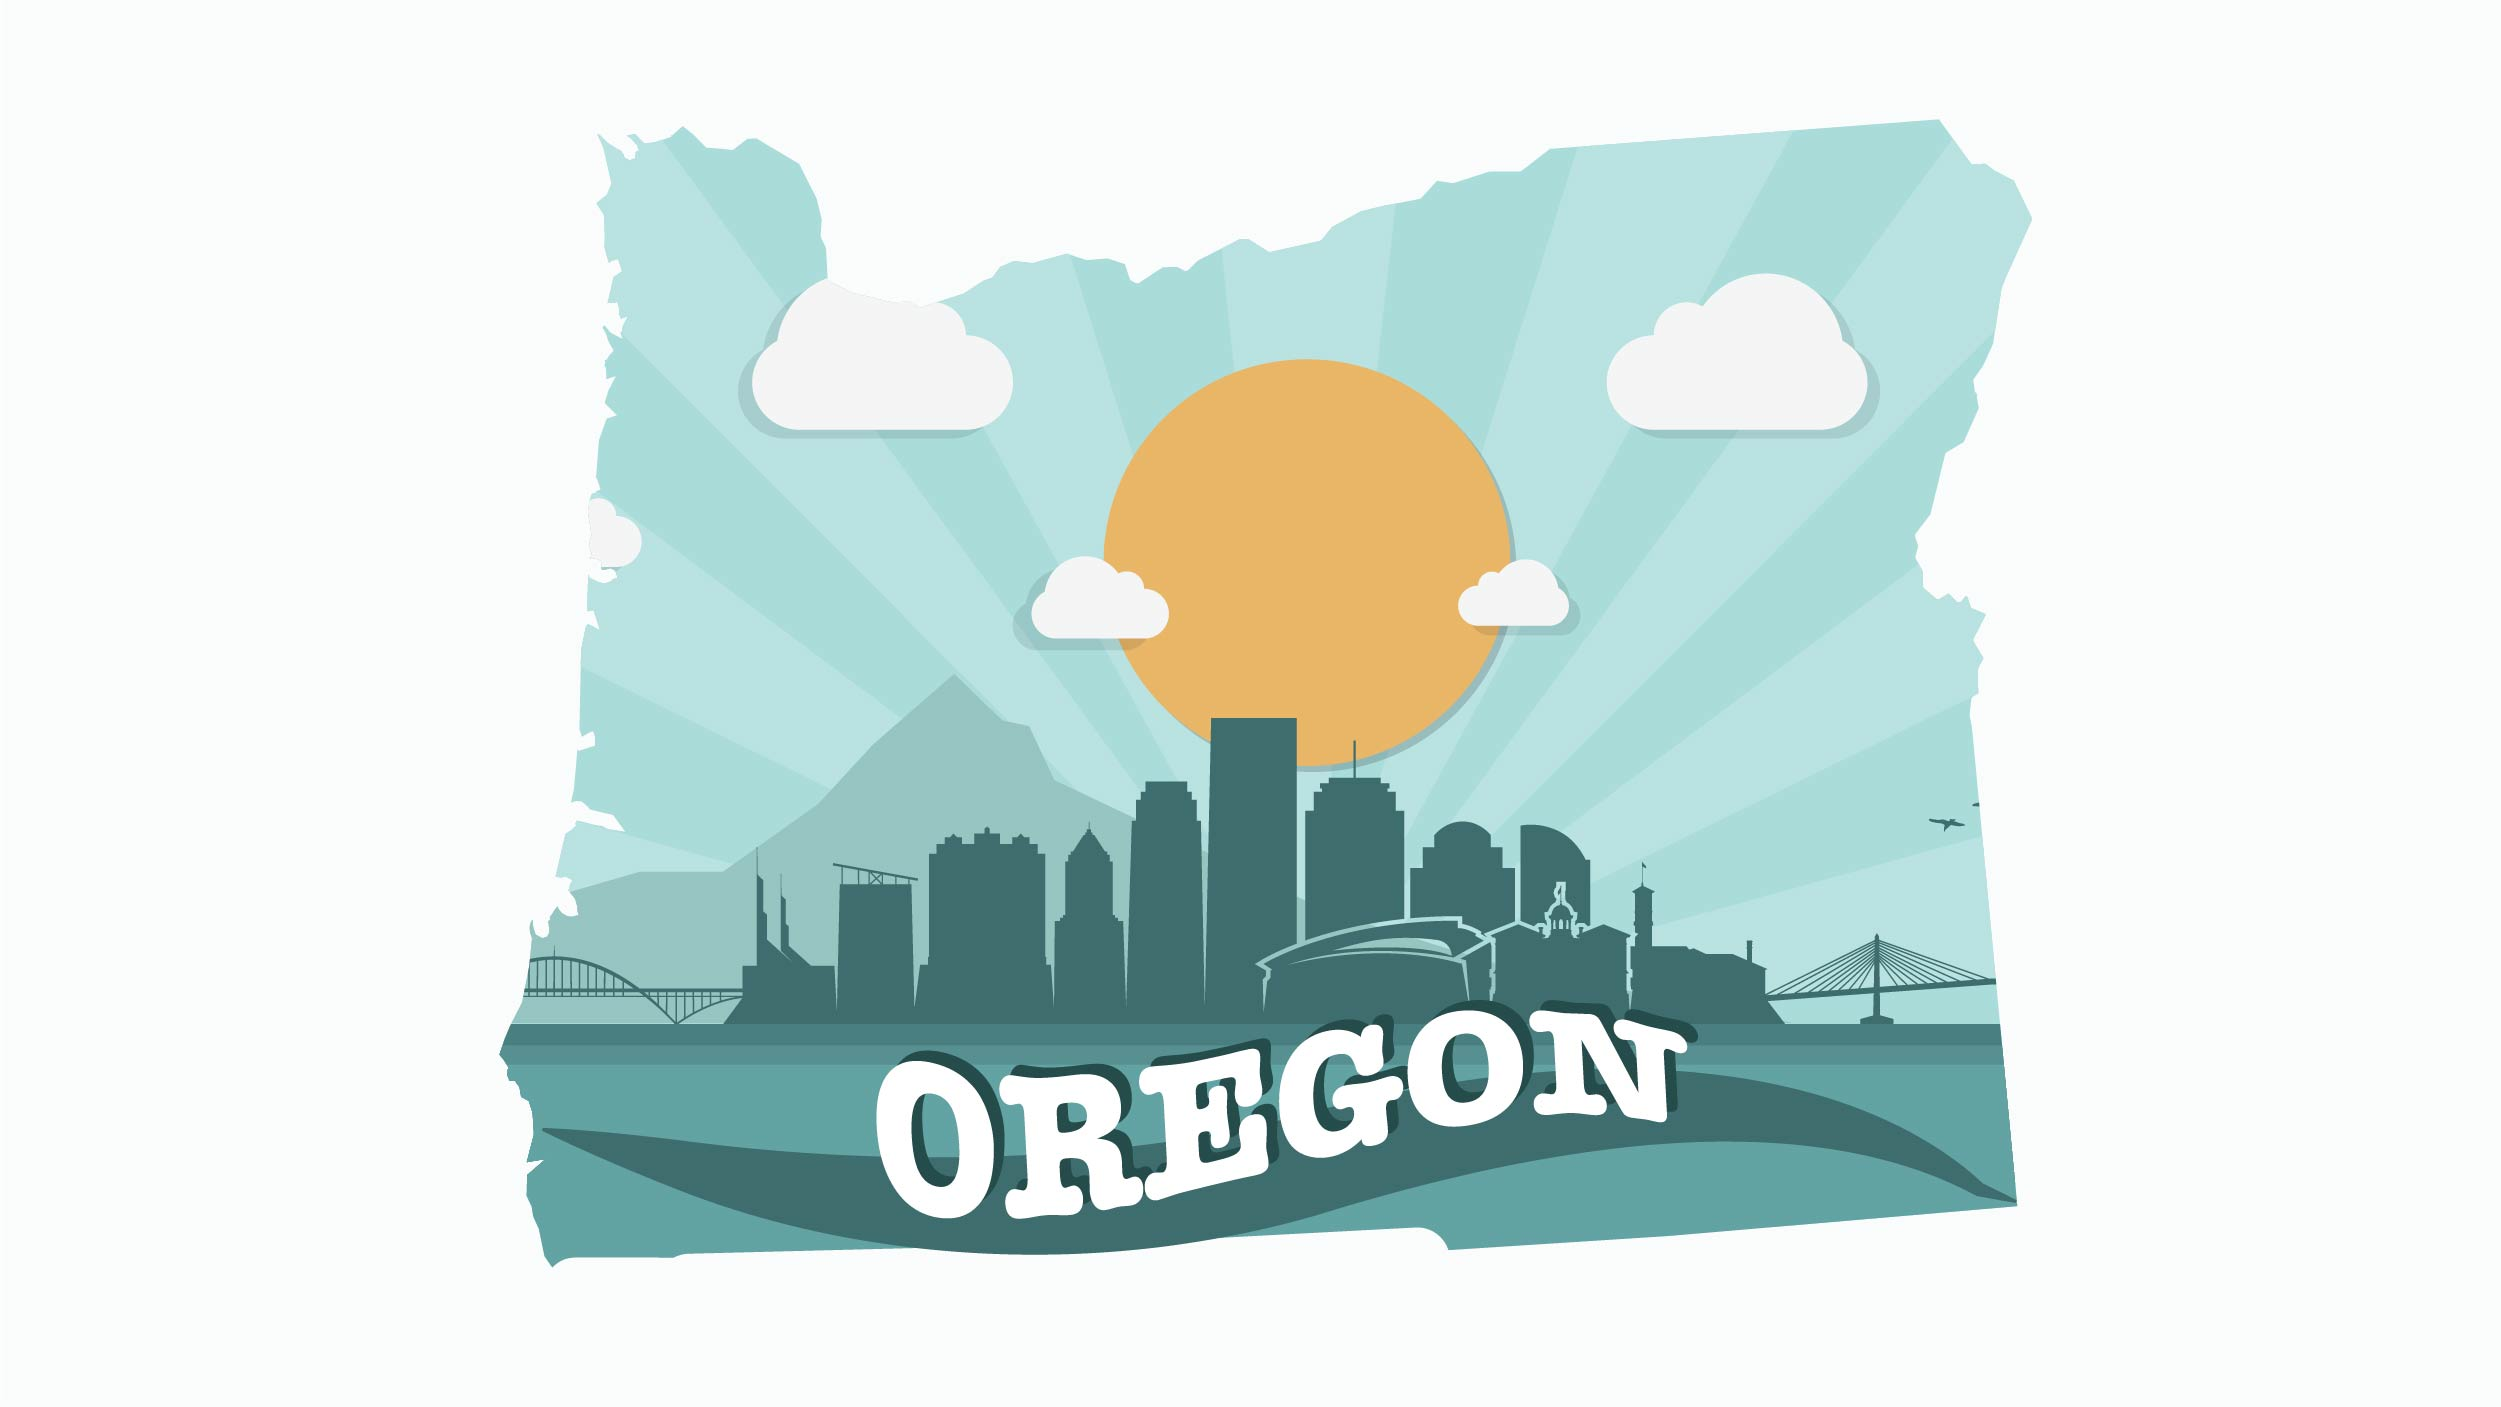 Illustration of Oregon state in the sun shine